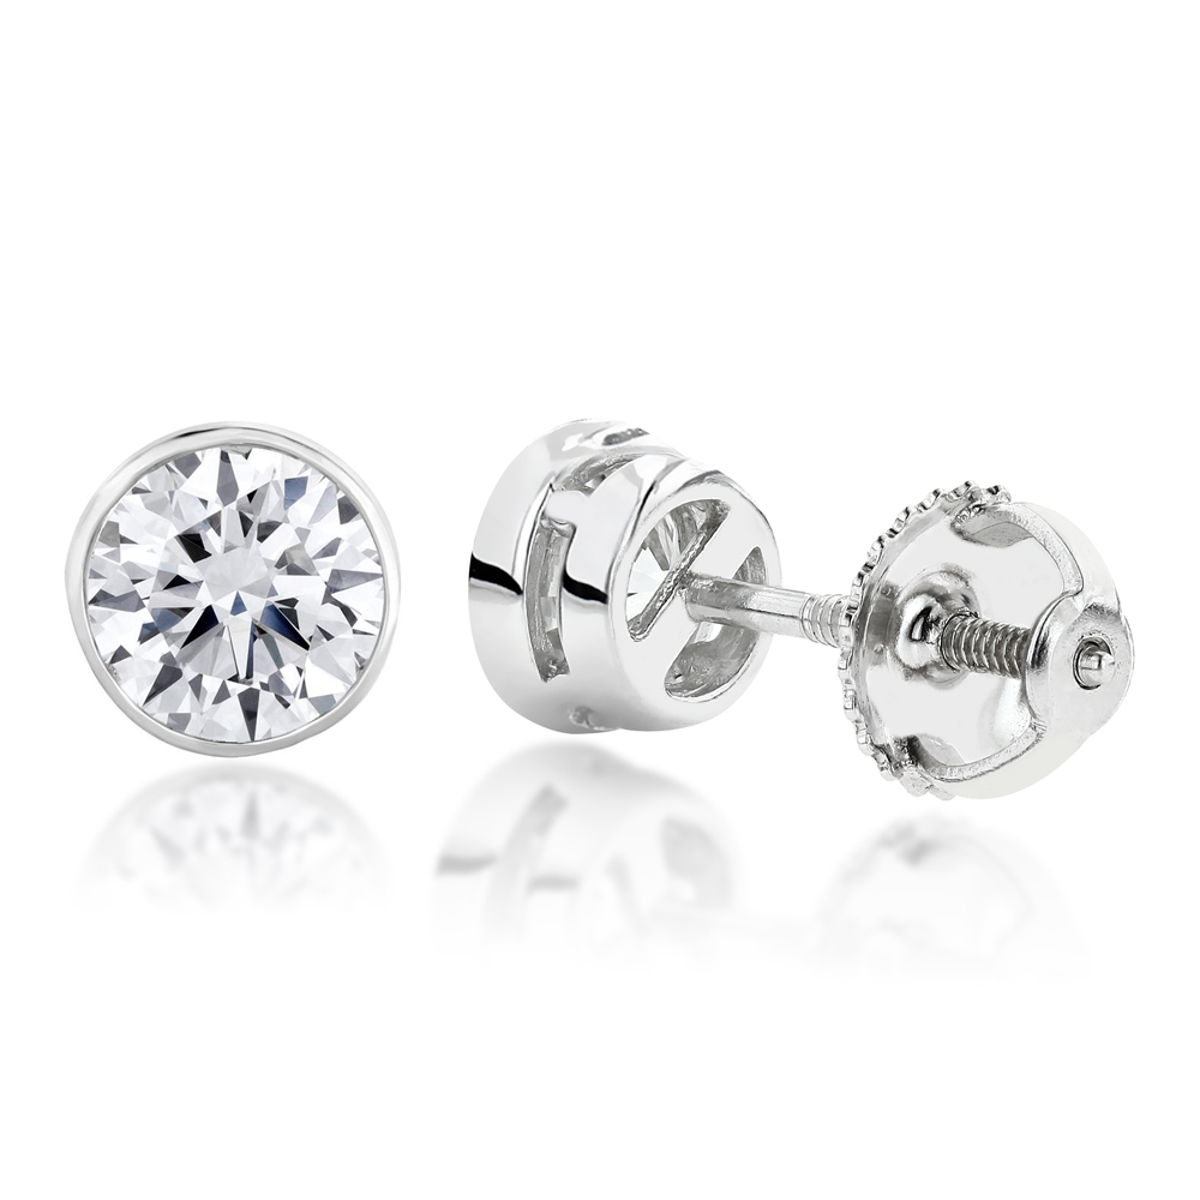 2ct Diamond Platinum Stud Earrings Bezel Set Round Cut